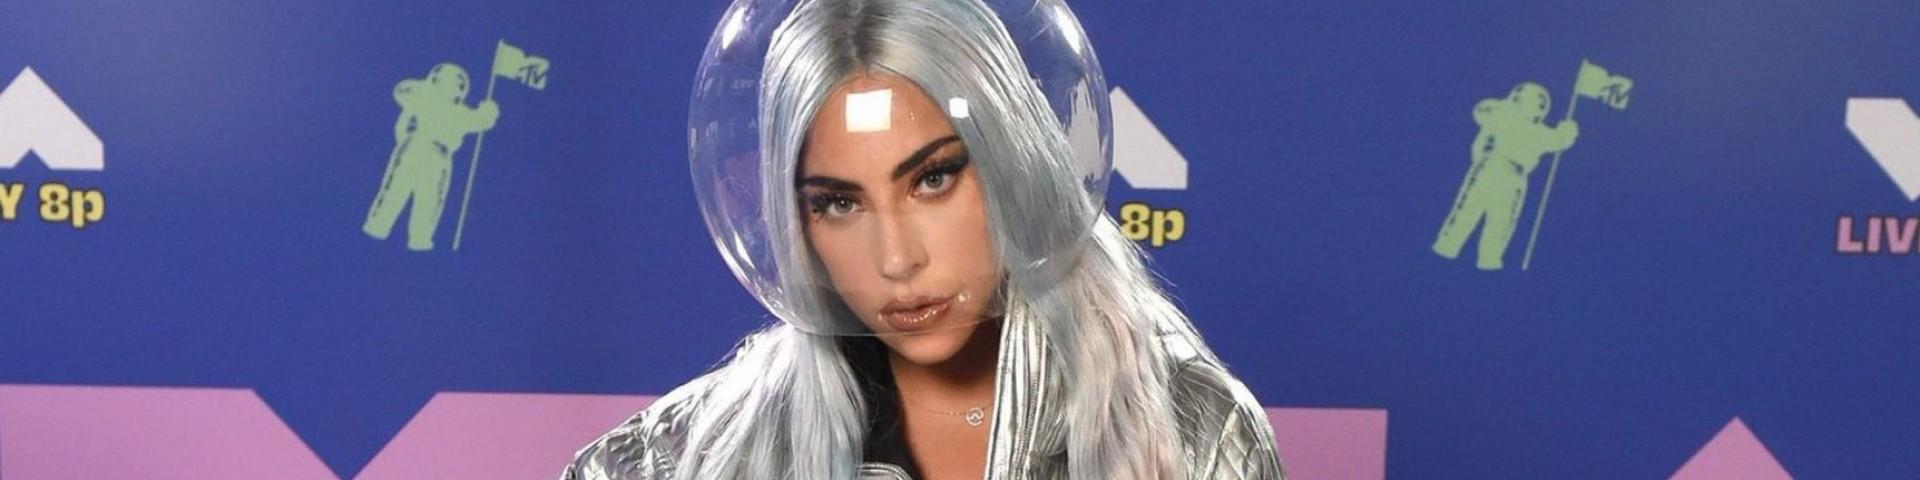 MTV VMA 2020: i look di Lady Gaga, Maluma e tanti altri (FOTO)